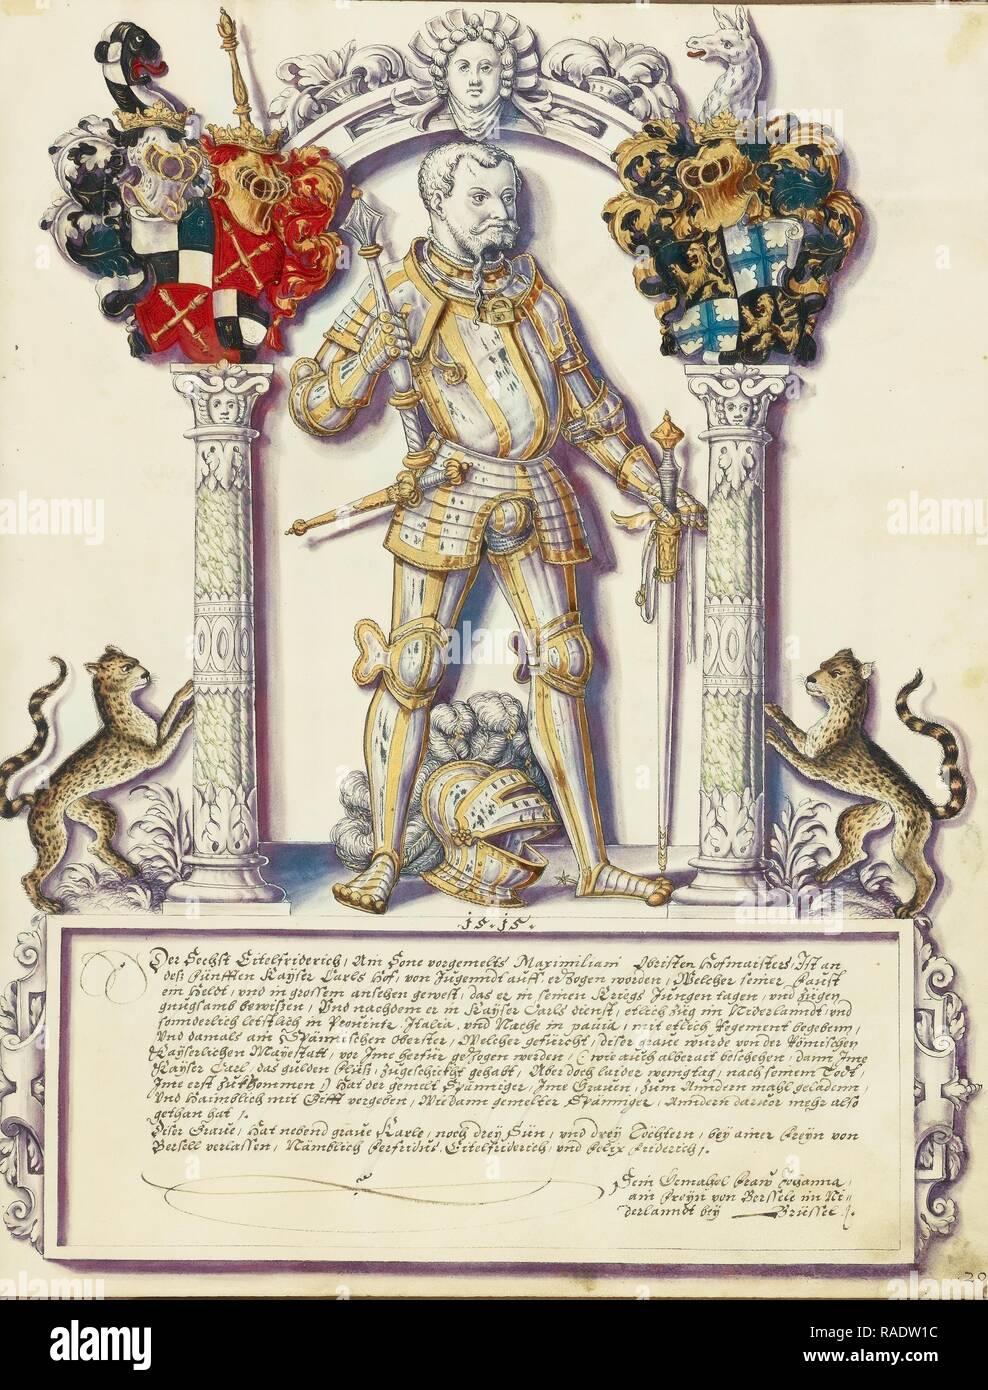 Eitelfriedrich VI Hohenzollern, Jörg Ziegler (German, early 16th century - 1574,1577), Rottenburg, Germany, about reimagined - Stock Image